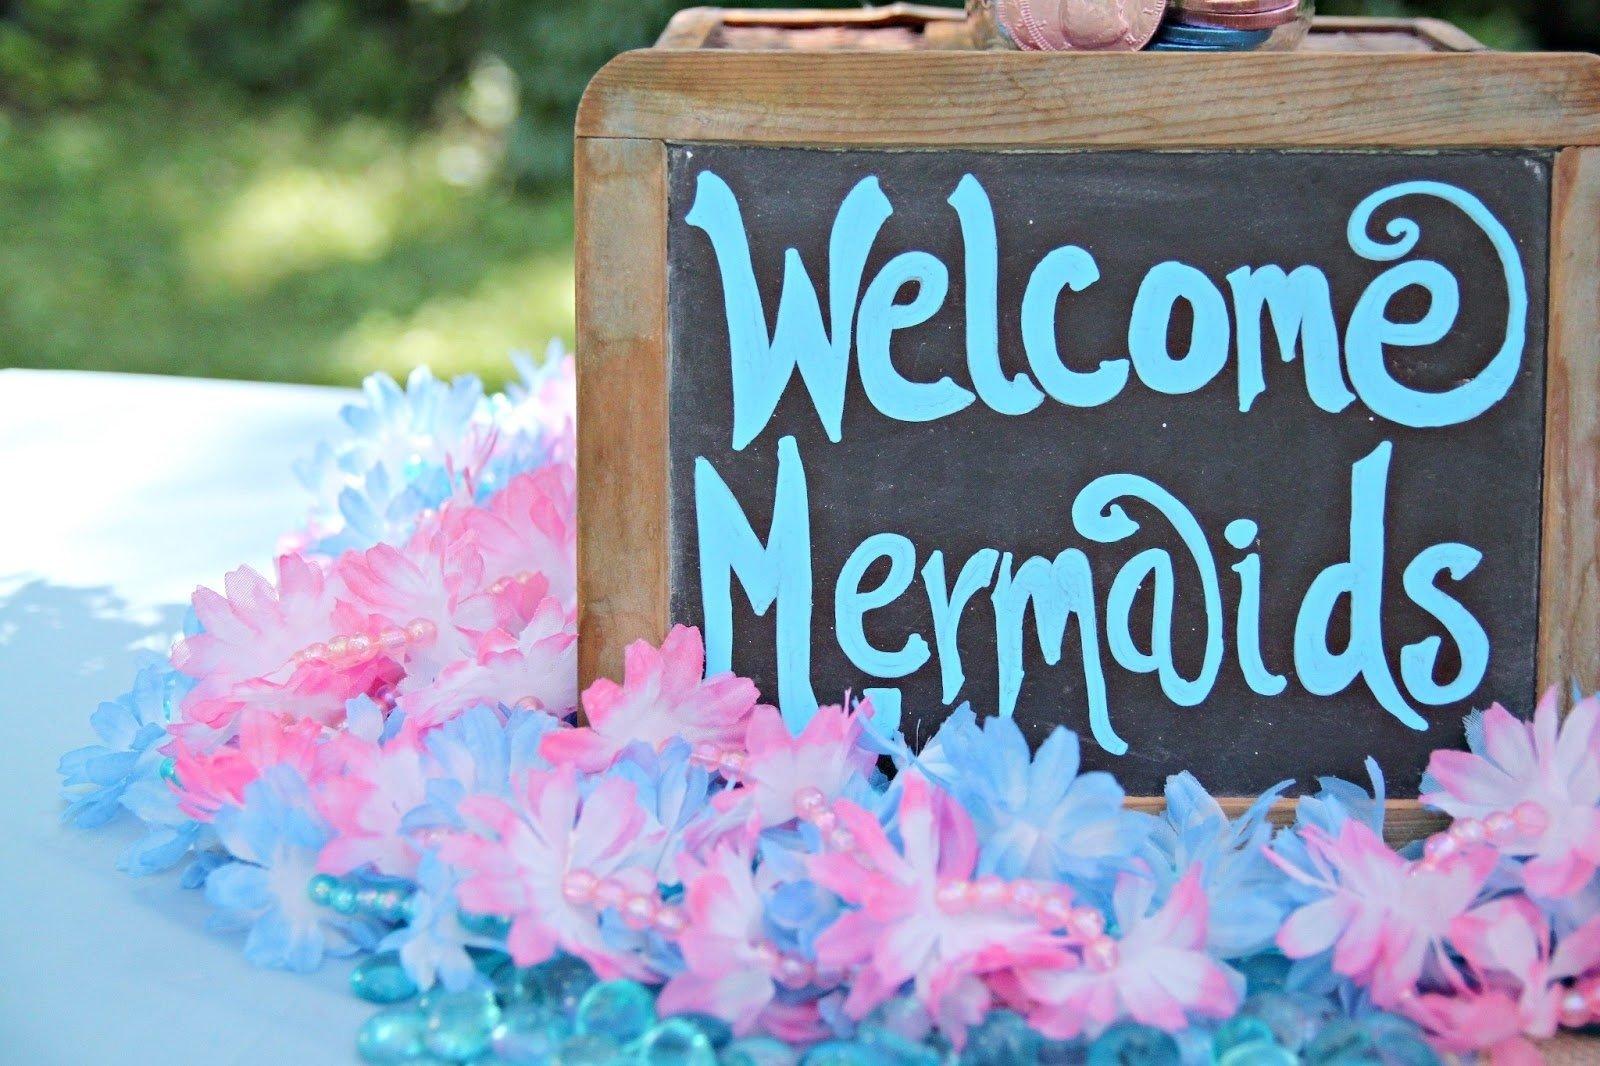 10 Pretty Little Mermaid Birthday Party Ideas 14 awesome little mermaid birthday party ideas birthday inspire 2 2021